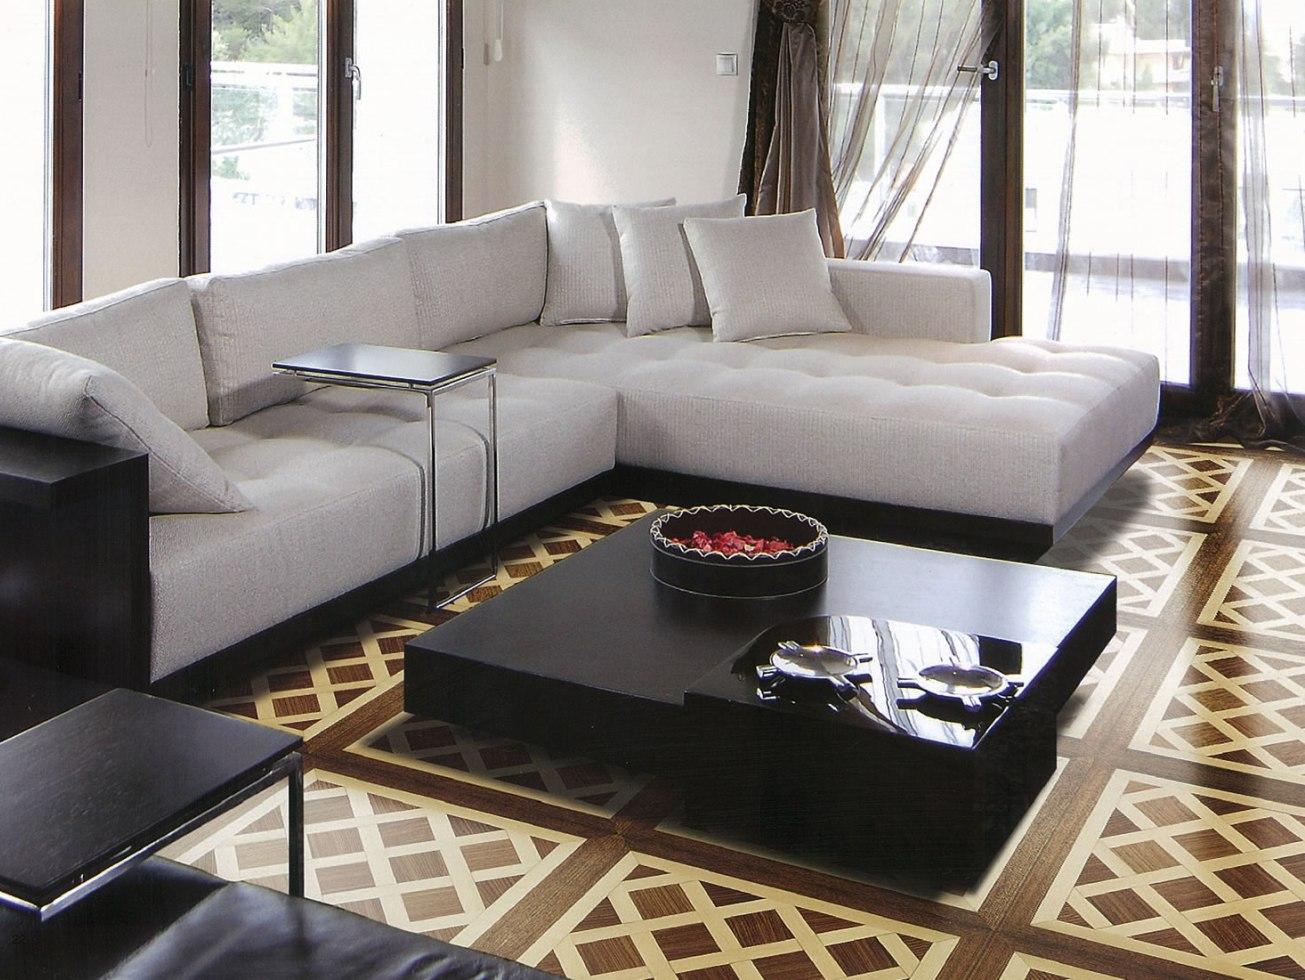 modern sofa sets designs queen size low profile sleeper sheet set best design home february 2013